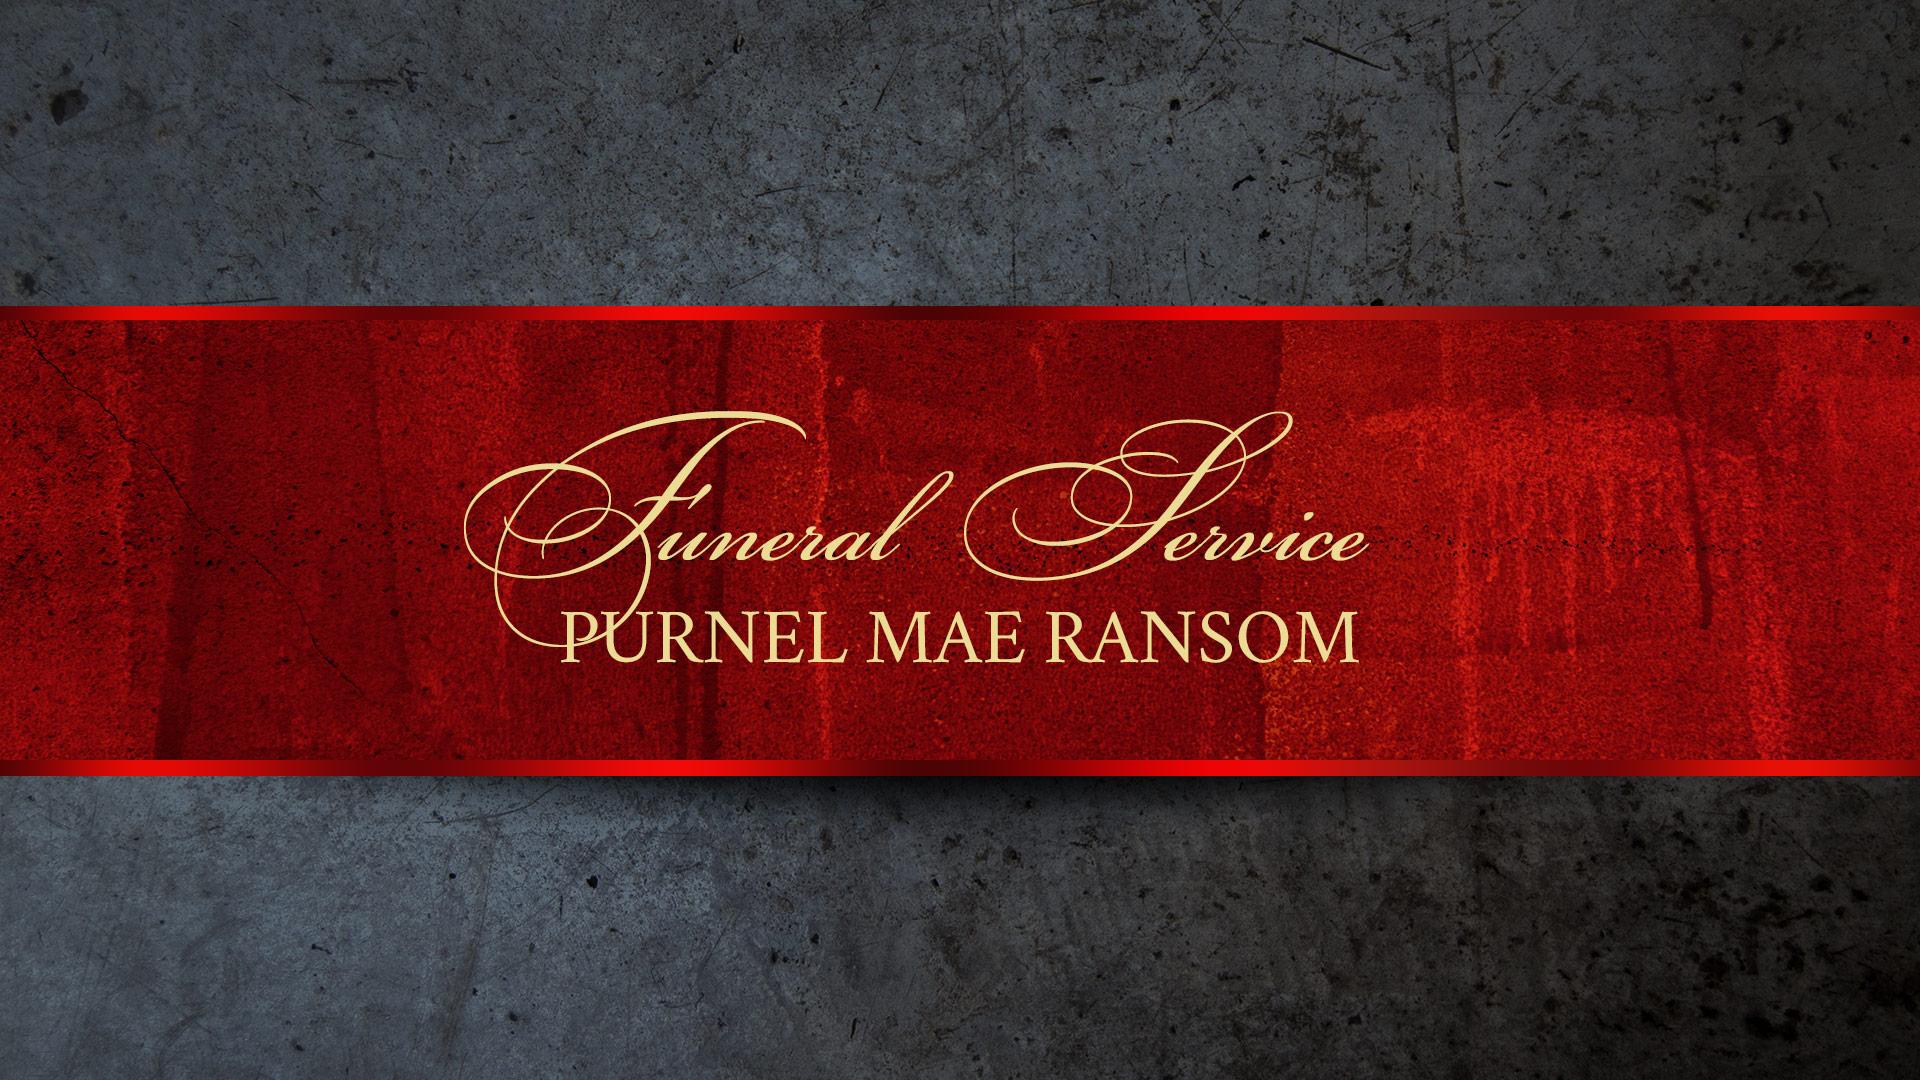 Funeral Service   Purnel Mae Ransom